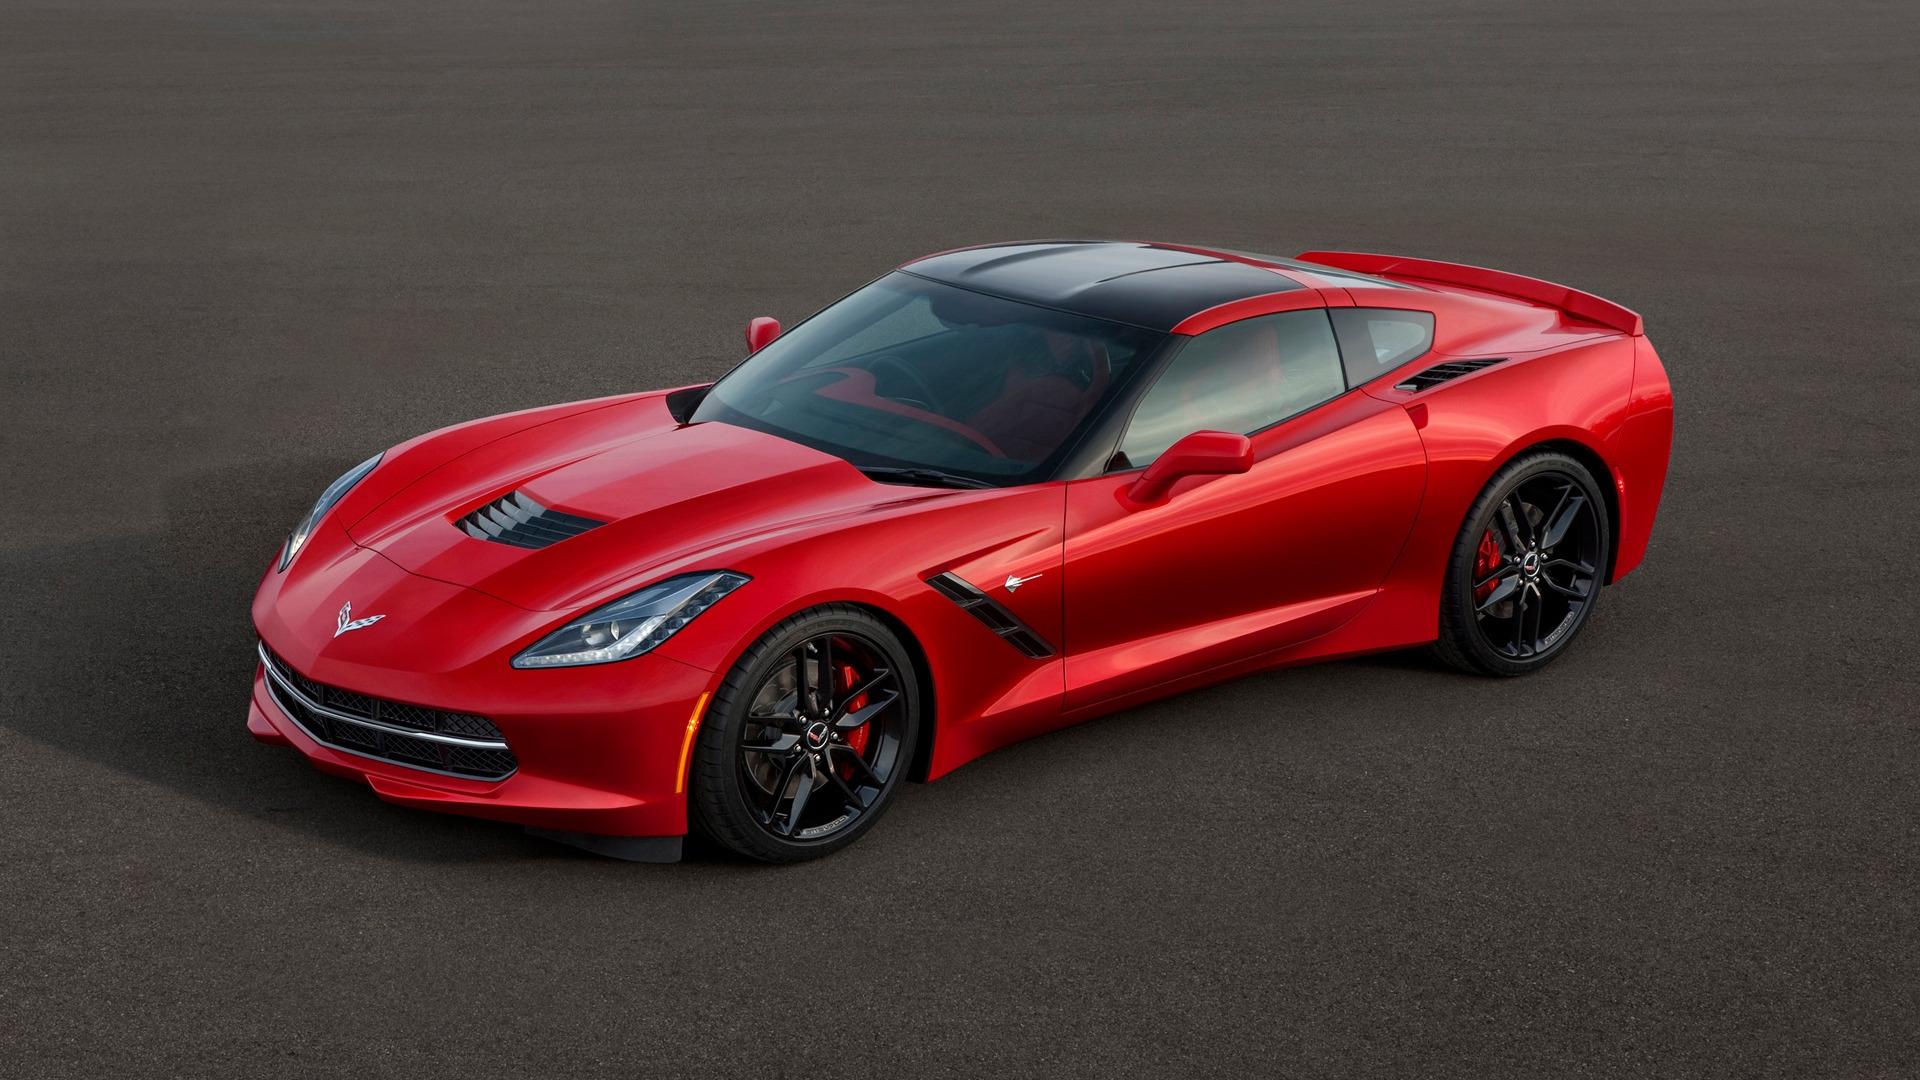 chevrolet-corvette-c-stingray-Corvette-Stingray-White-within-che-wallpaper-wpc5801234